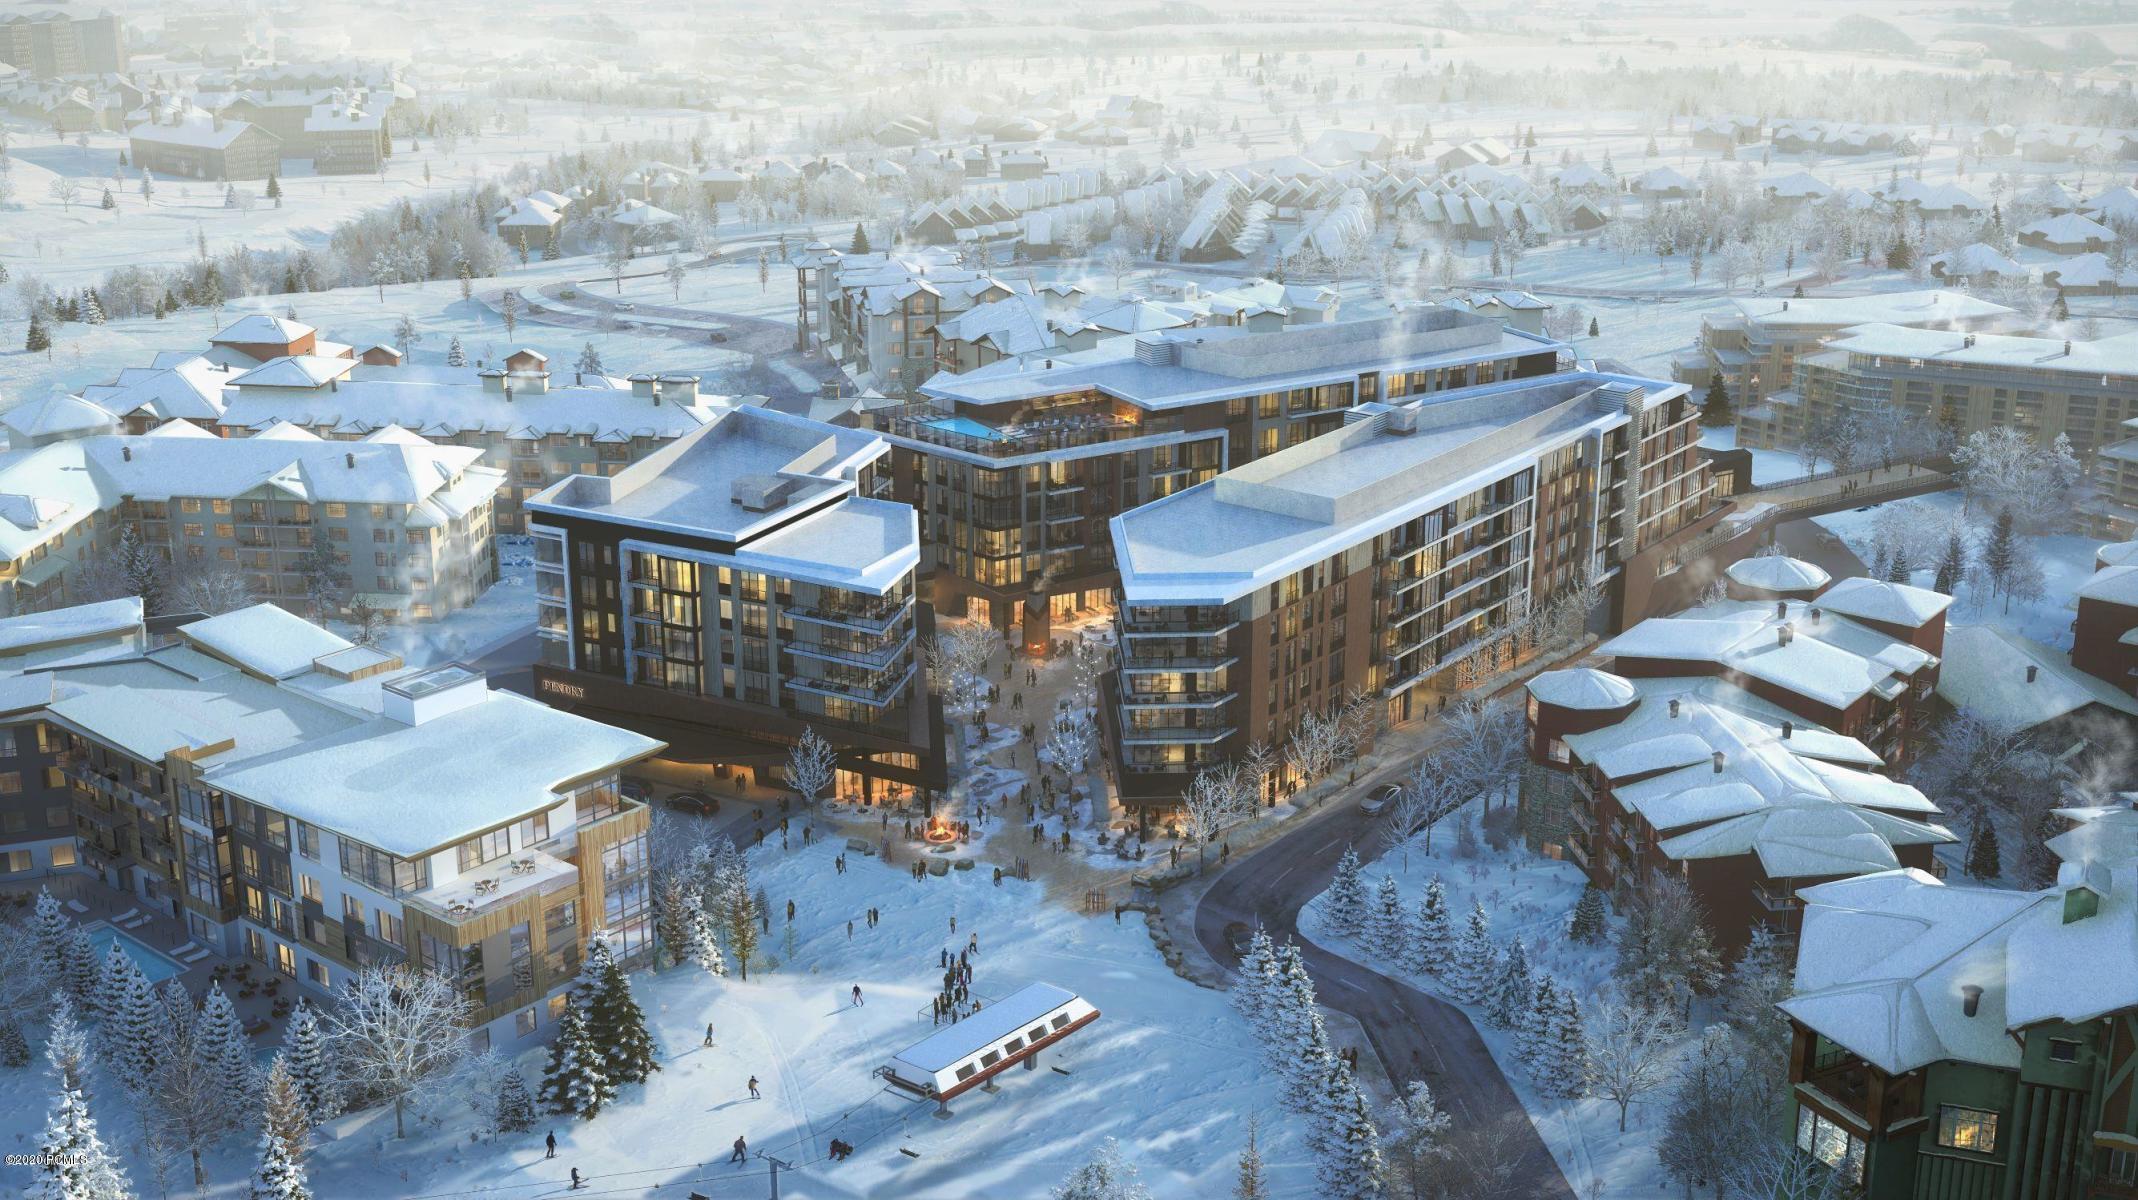 2417 High Mountain Road, Park City, Utah 84098, 2 Bedrooms Bedrooms, ,2 BathroomsBathrooms,Condominium,For Sale,High Mountain,12004233